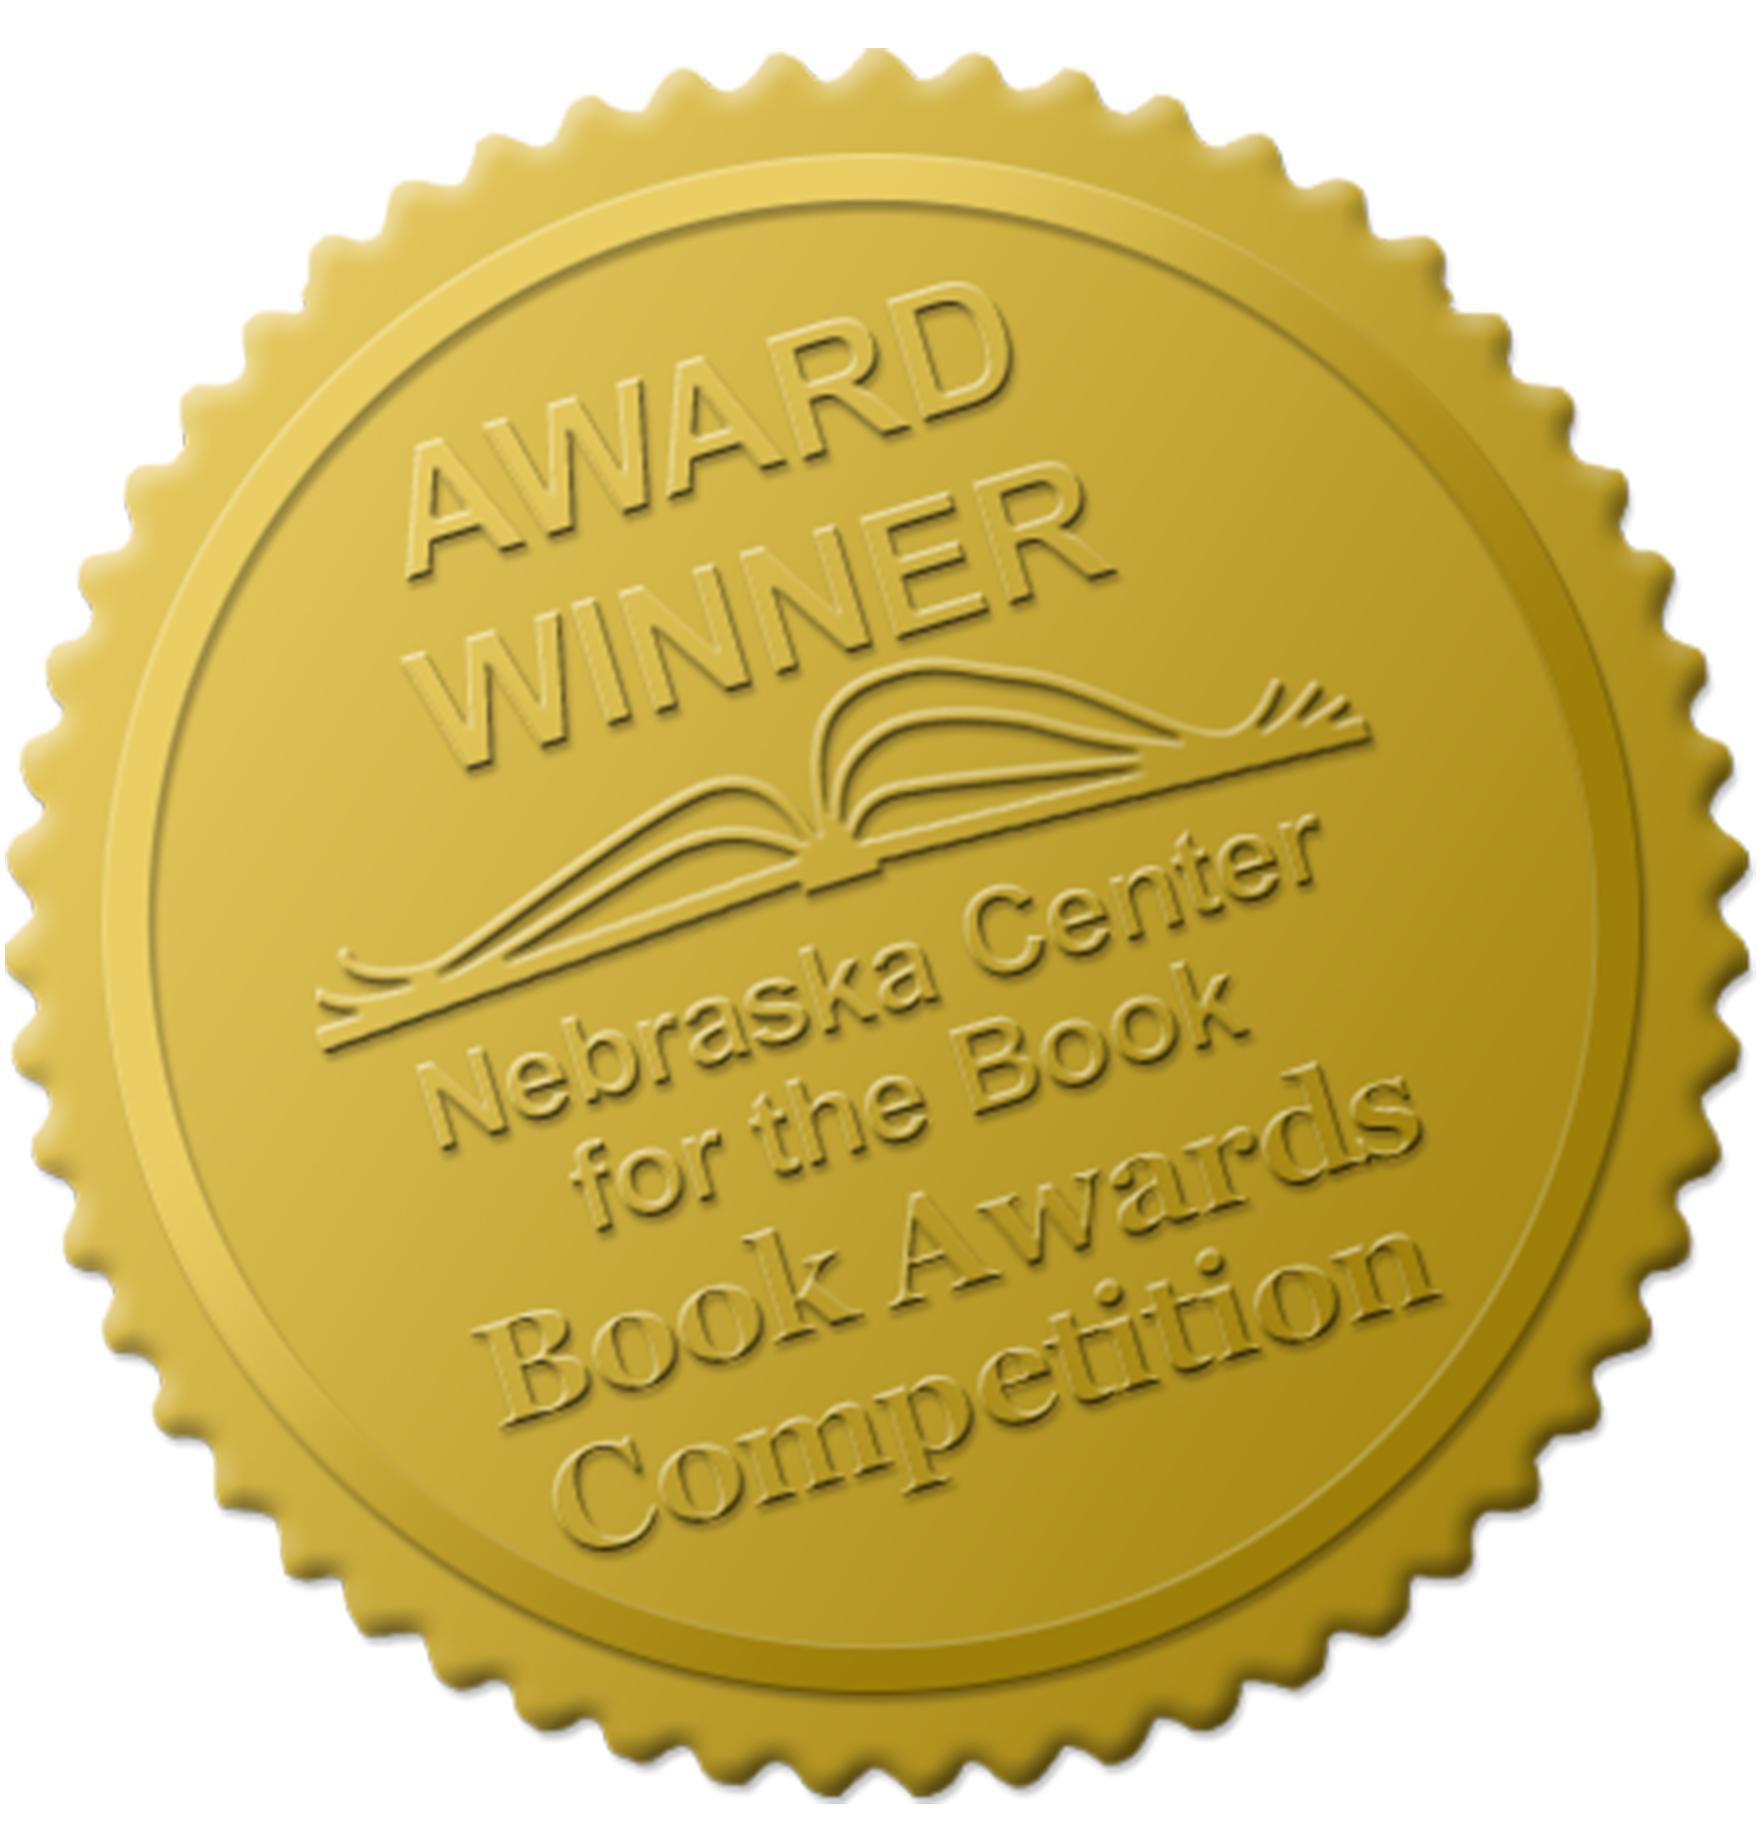 NEBRASKA BOOK AWARD | BEST FICTION | ALEX KAVA | STRANDED and LOST CREED